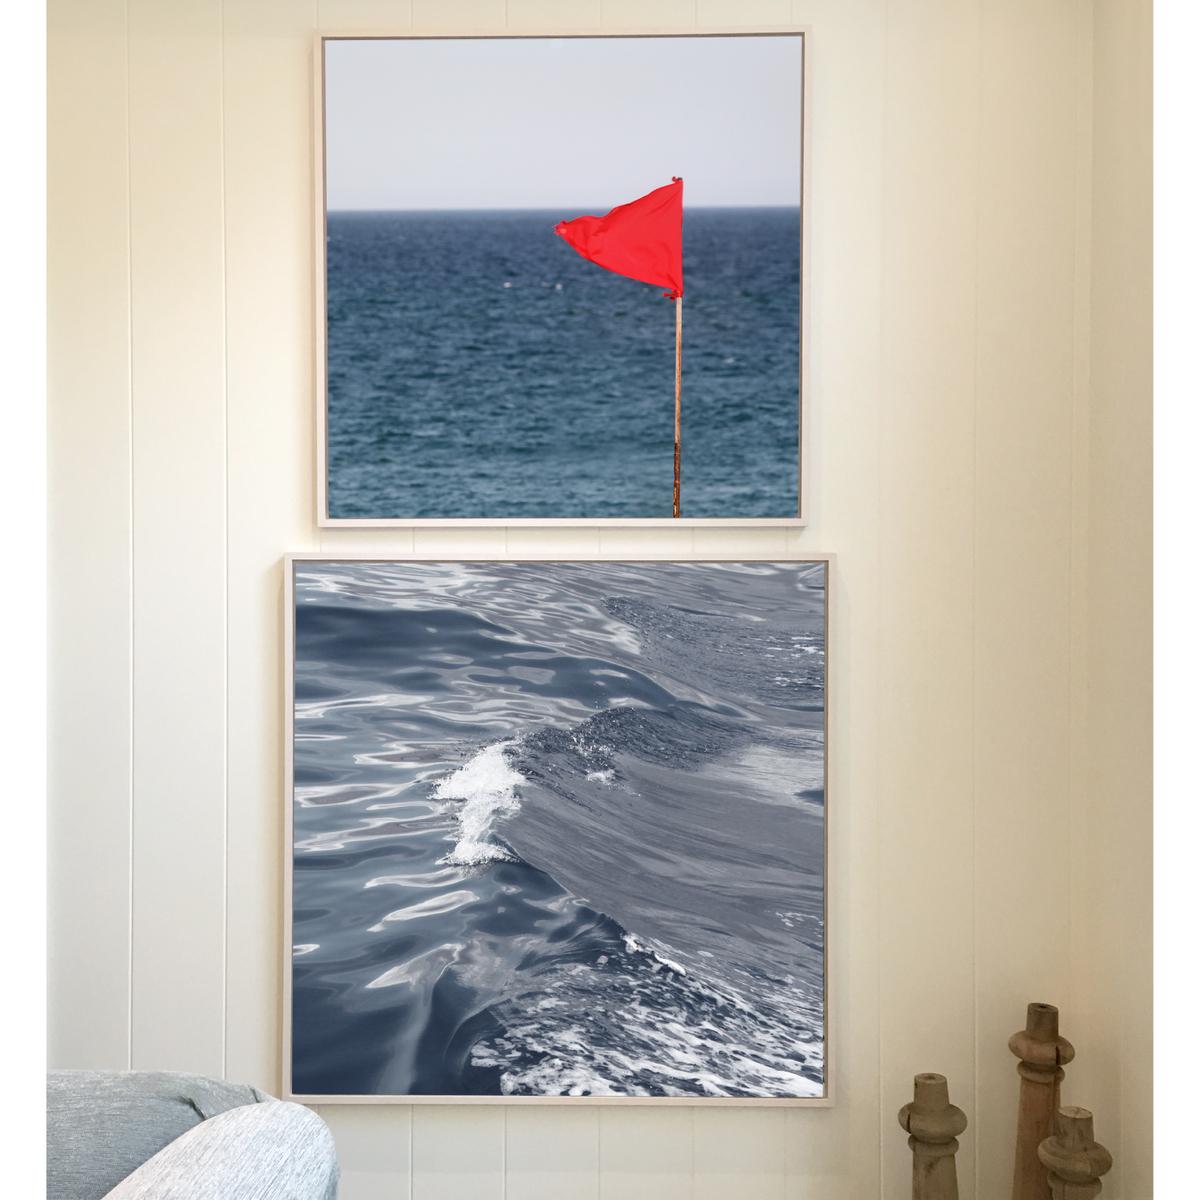 RED FLAG & OCEAN SERIES No. 3